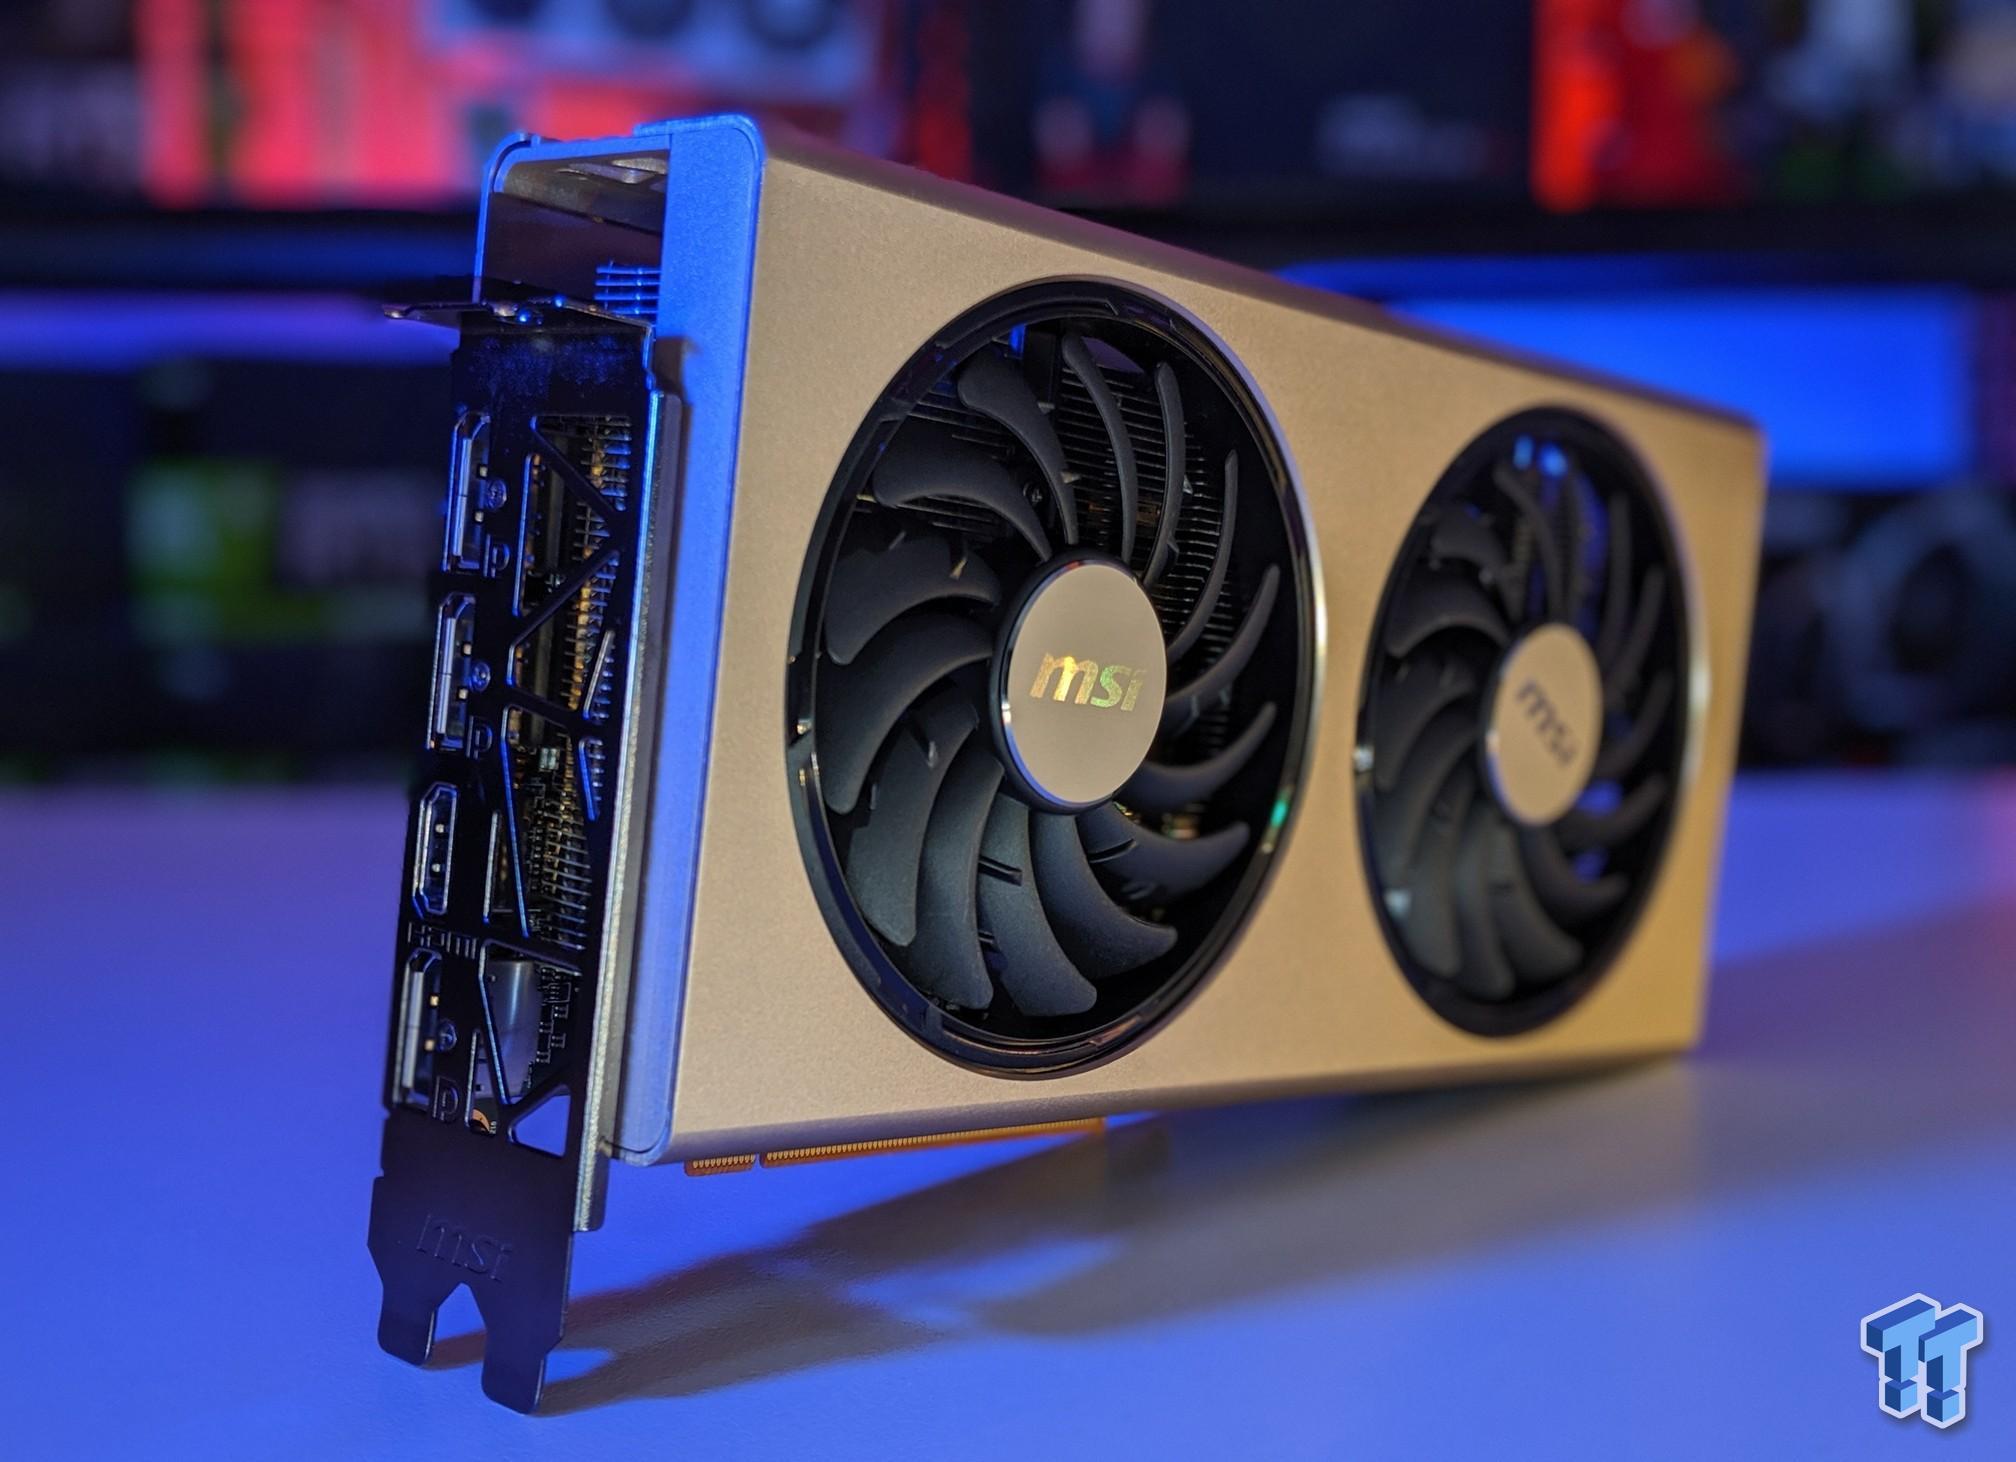 MSI Radeon RX 5700 XT EVOKE OC: Evoking the Best Navi